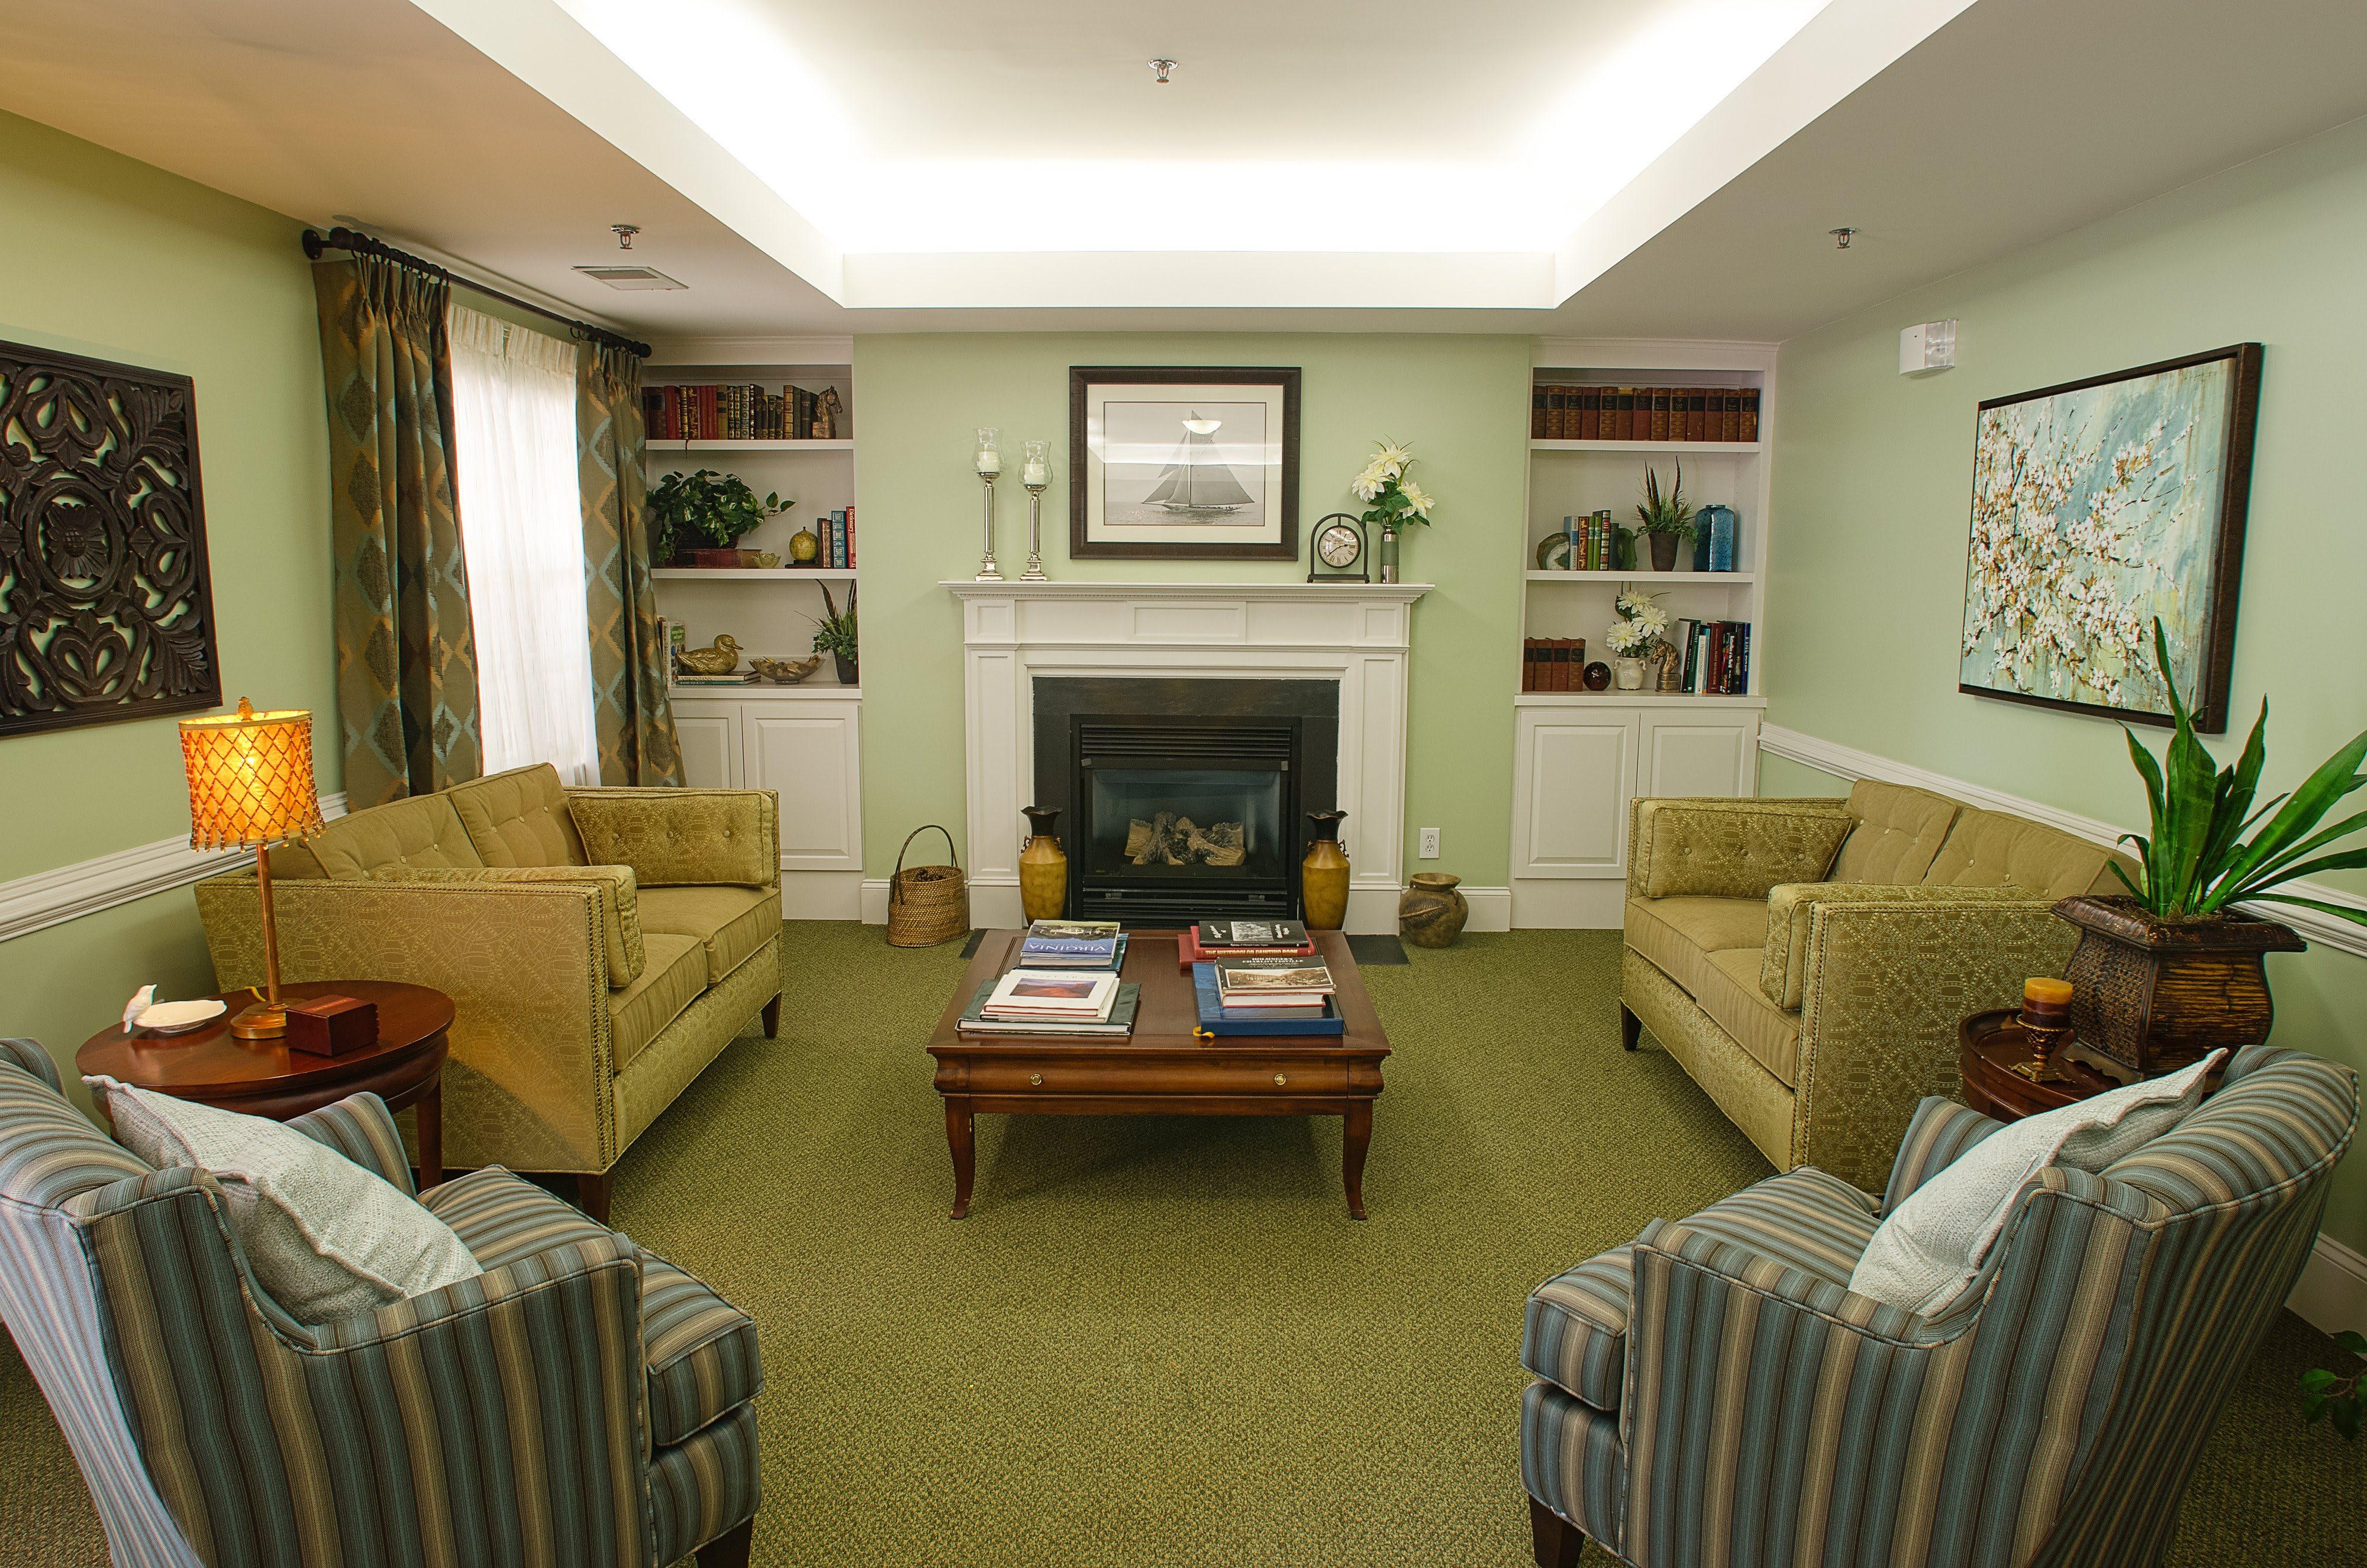 Photo 1 of Commonwealth Senior Living at Charlottesville